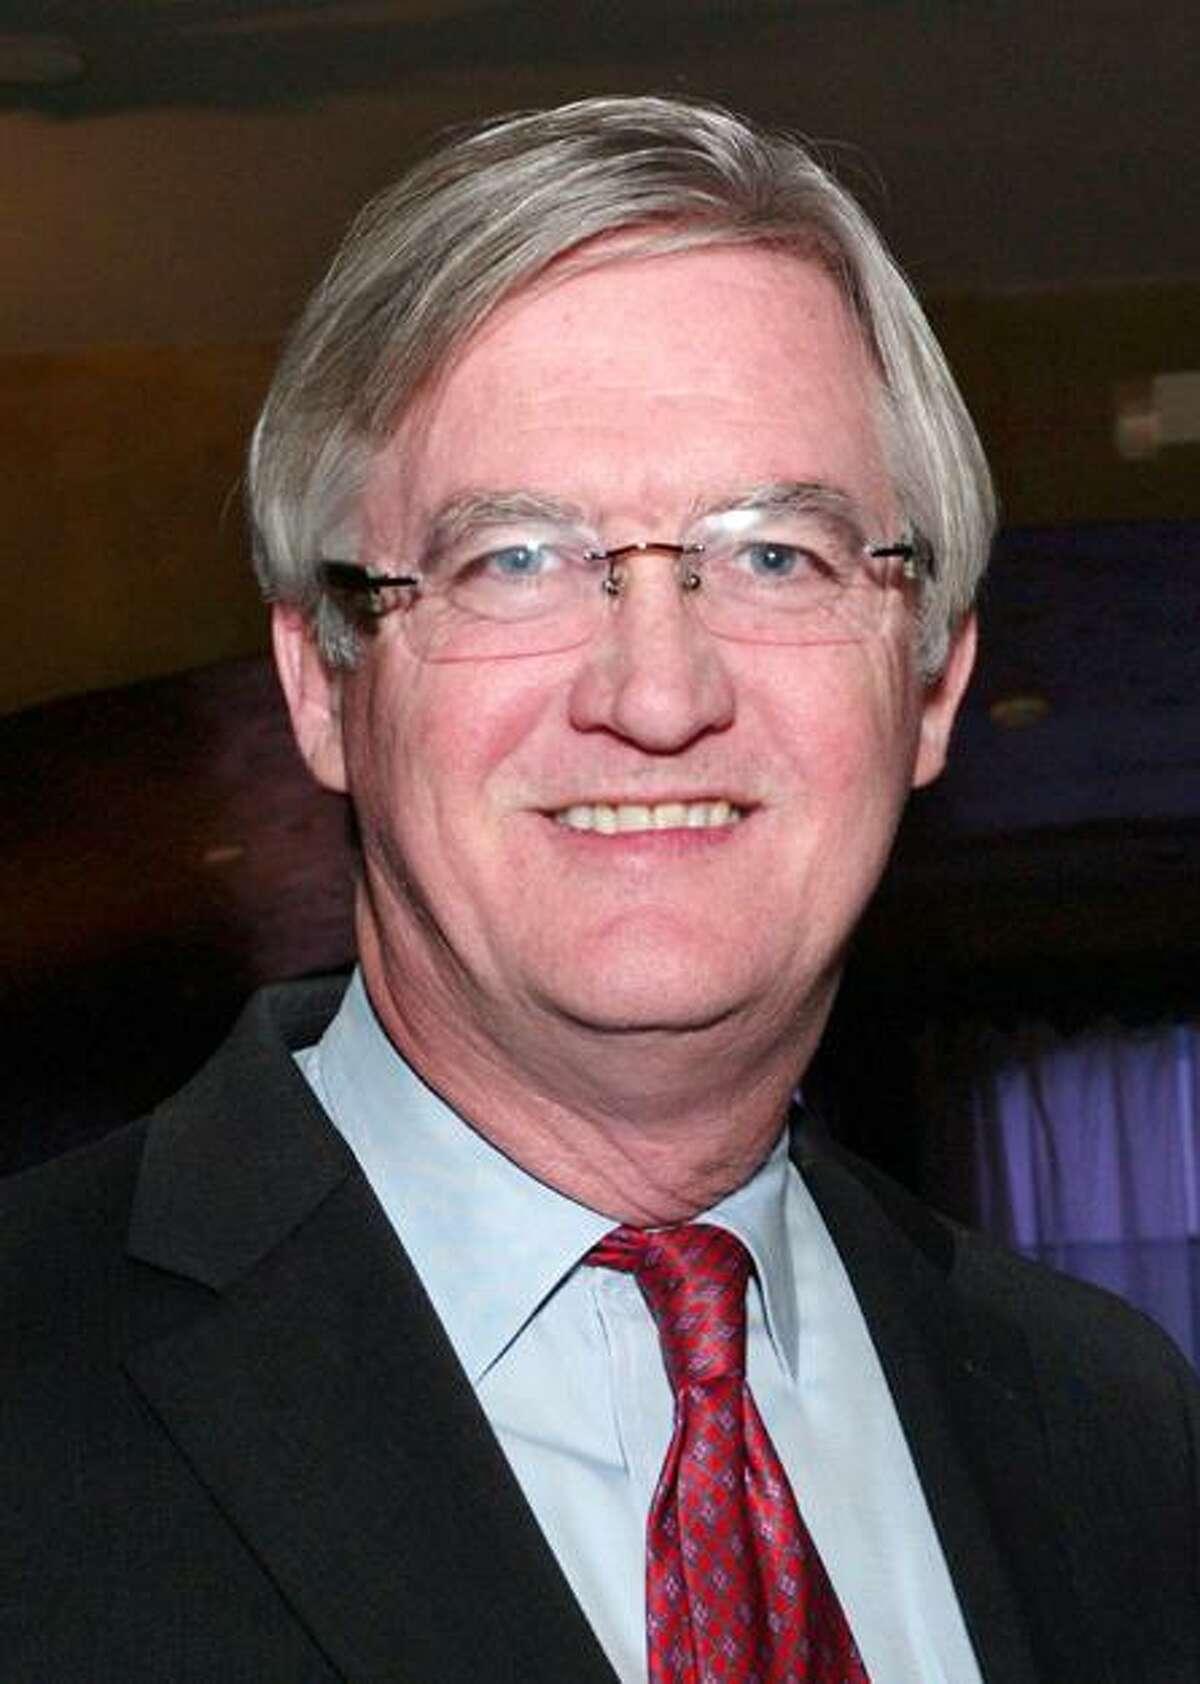 Robert Thrailkill is general manager of the Hilton Palacio del Rio.